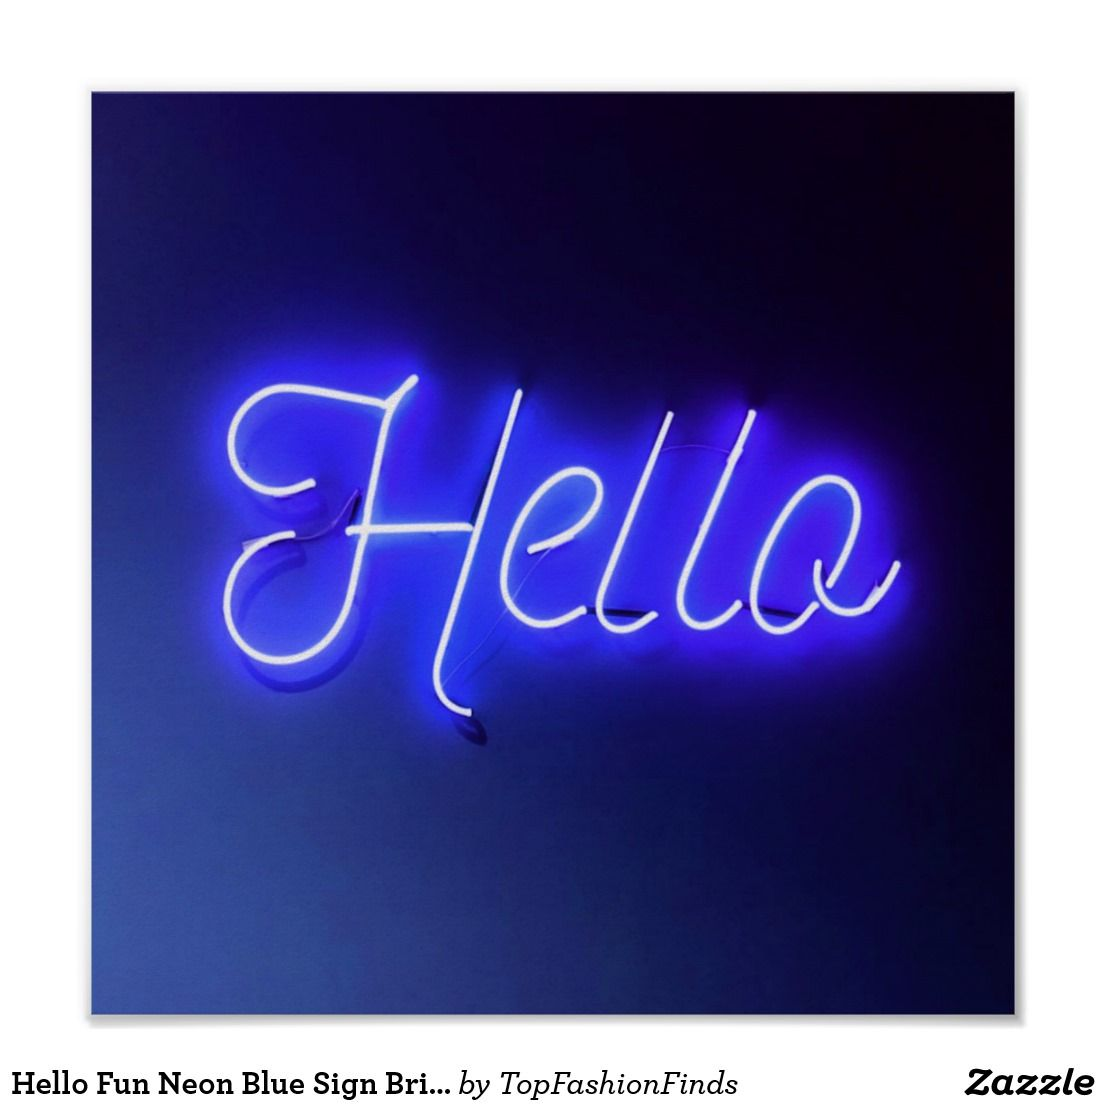 Hello Fun Neon Blue Sign Bright And Cheerful Zazzle Com In 2021 Blue Neon Lights Neon Blue Neon